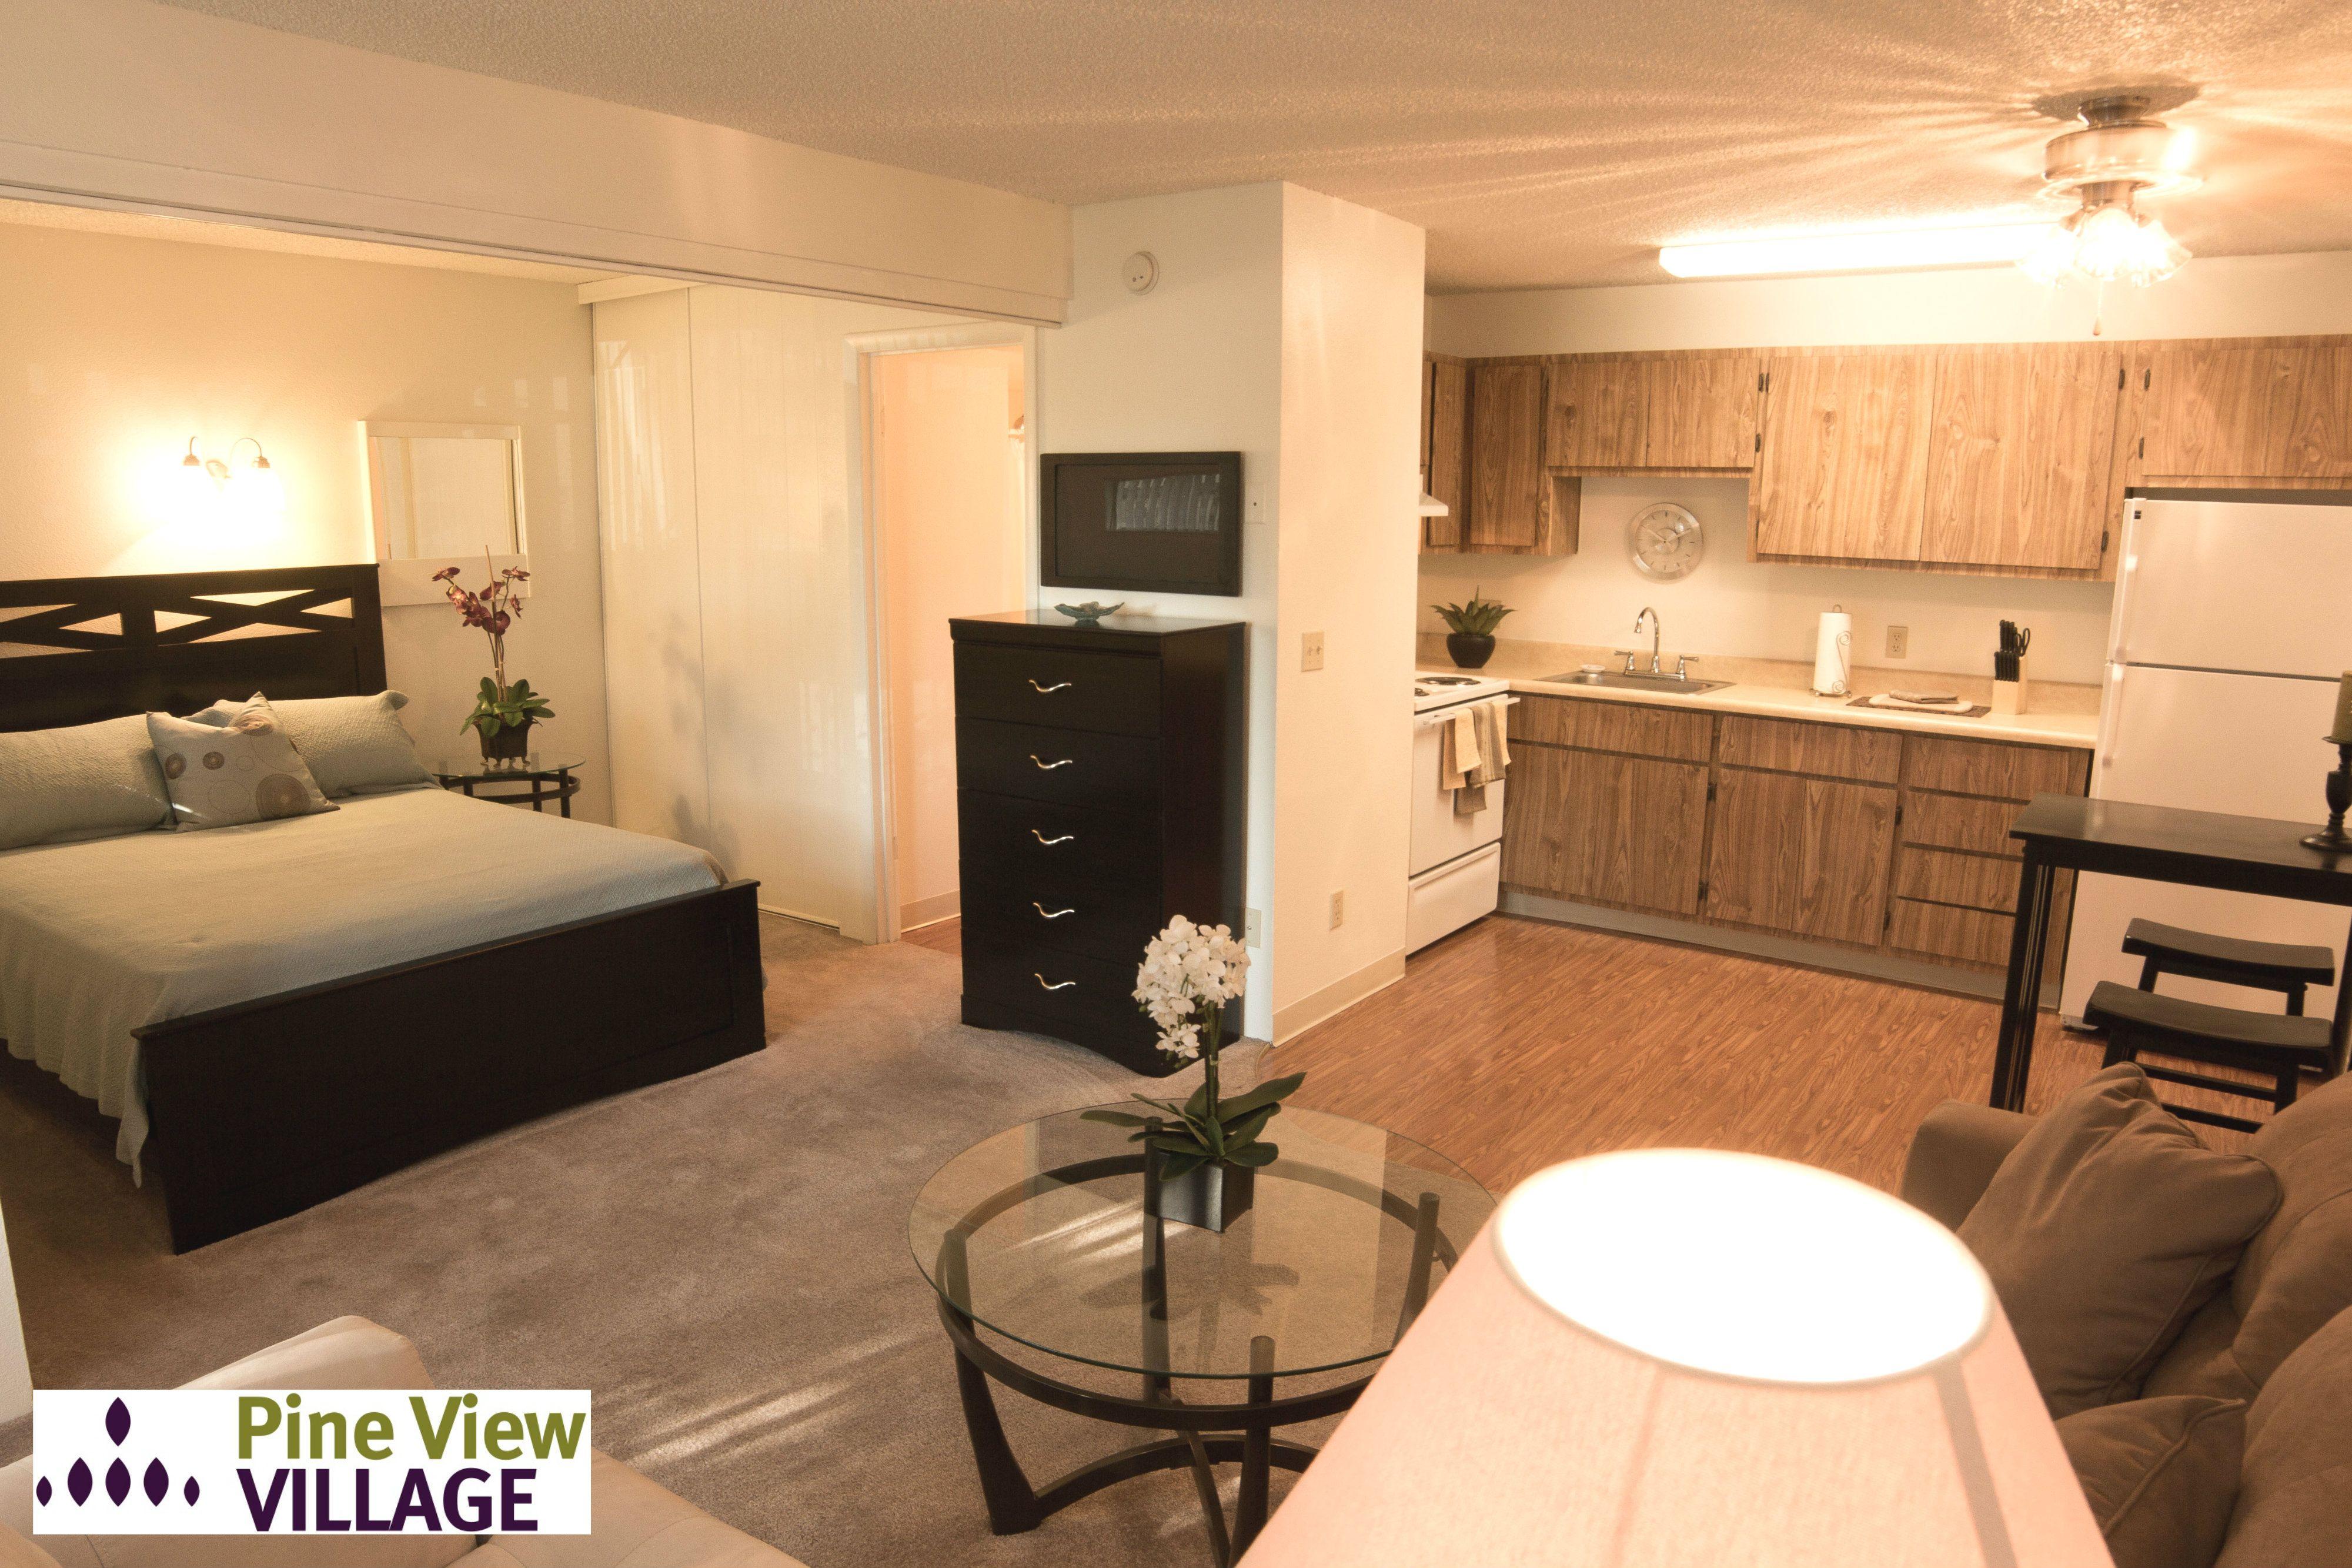 Pine View Village Apartments Executive Studio Suite Flagstaff Az Apartment 4 Bedroom Apartments Home